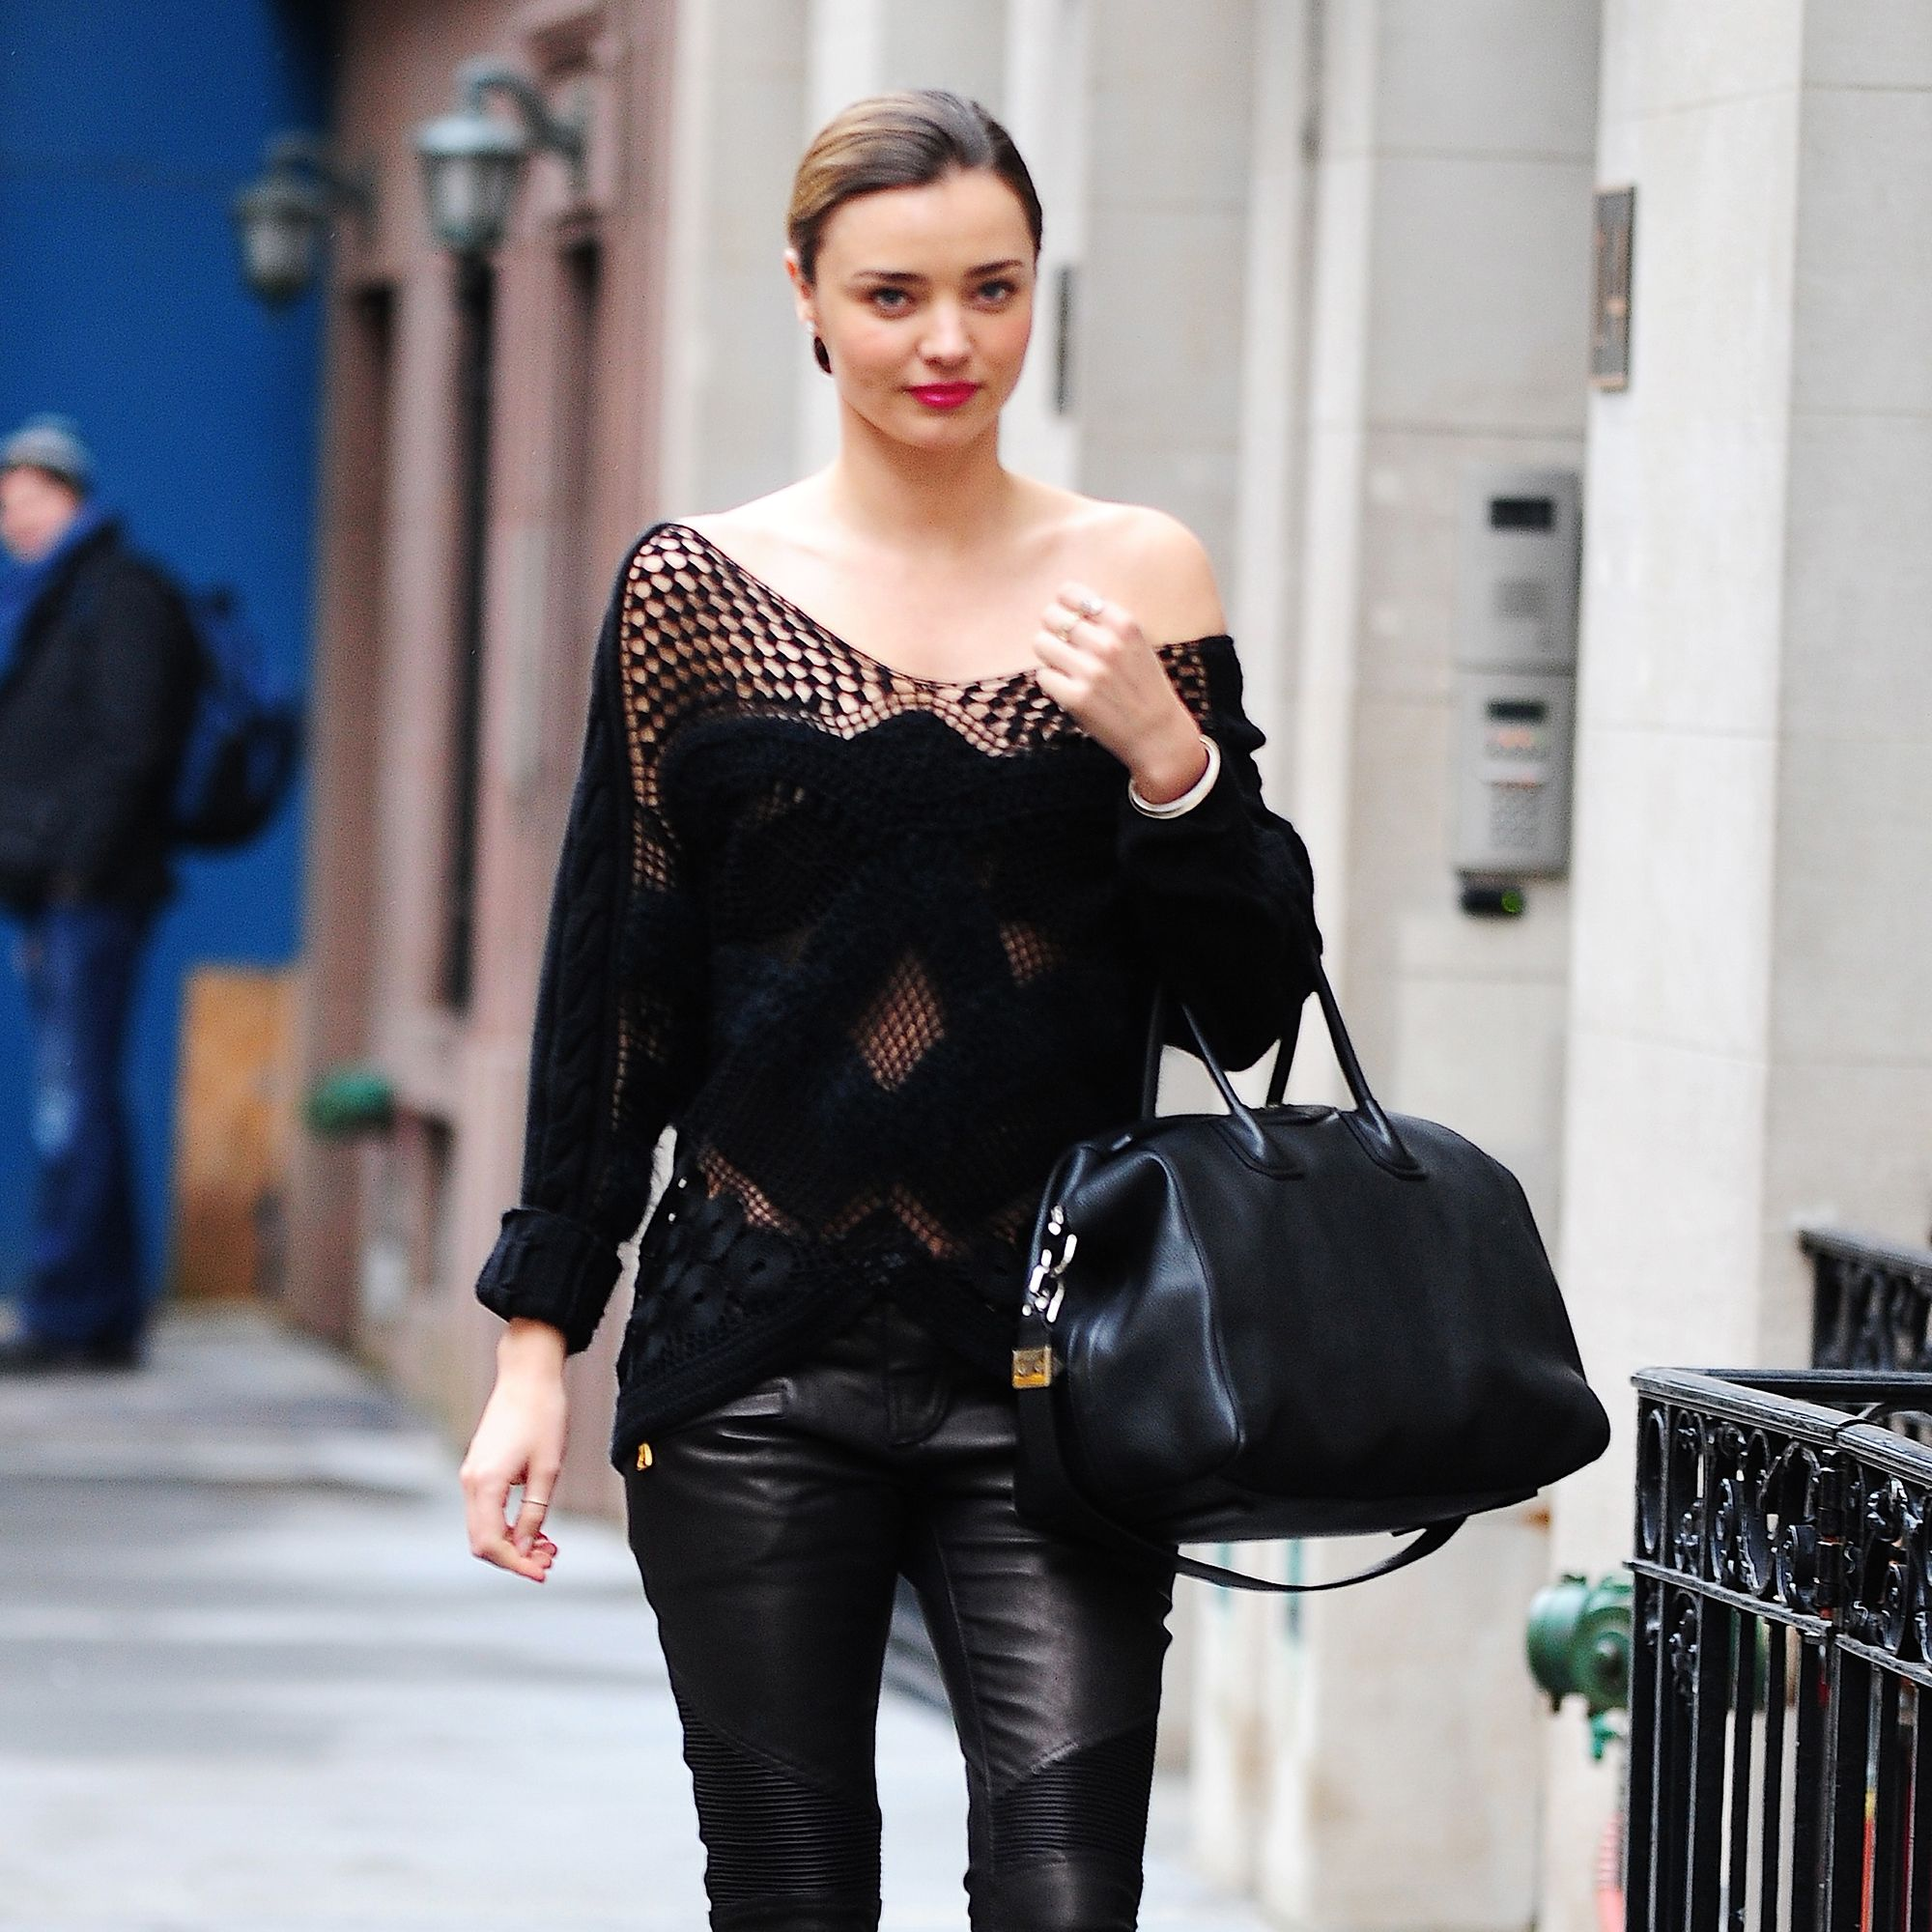 NEW YORK, NY - DECEMBER 19: Miranda Kerr is seen on December 19, 2013 in New York City. (Photo by Alo Ceballos/FilmMagic)